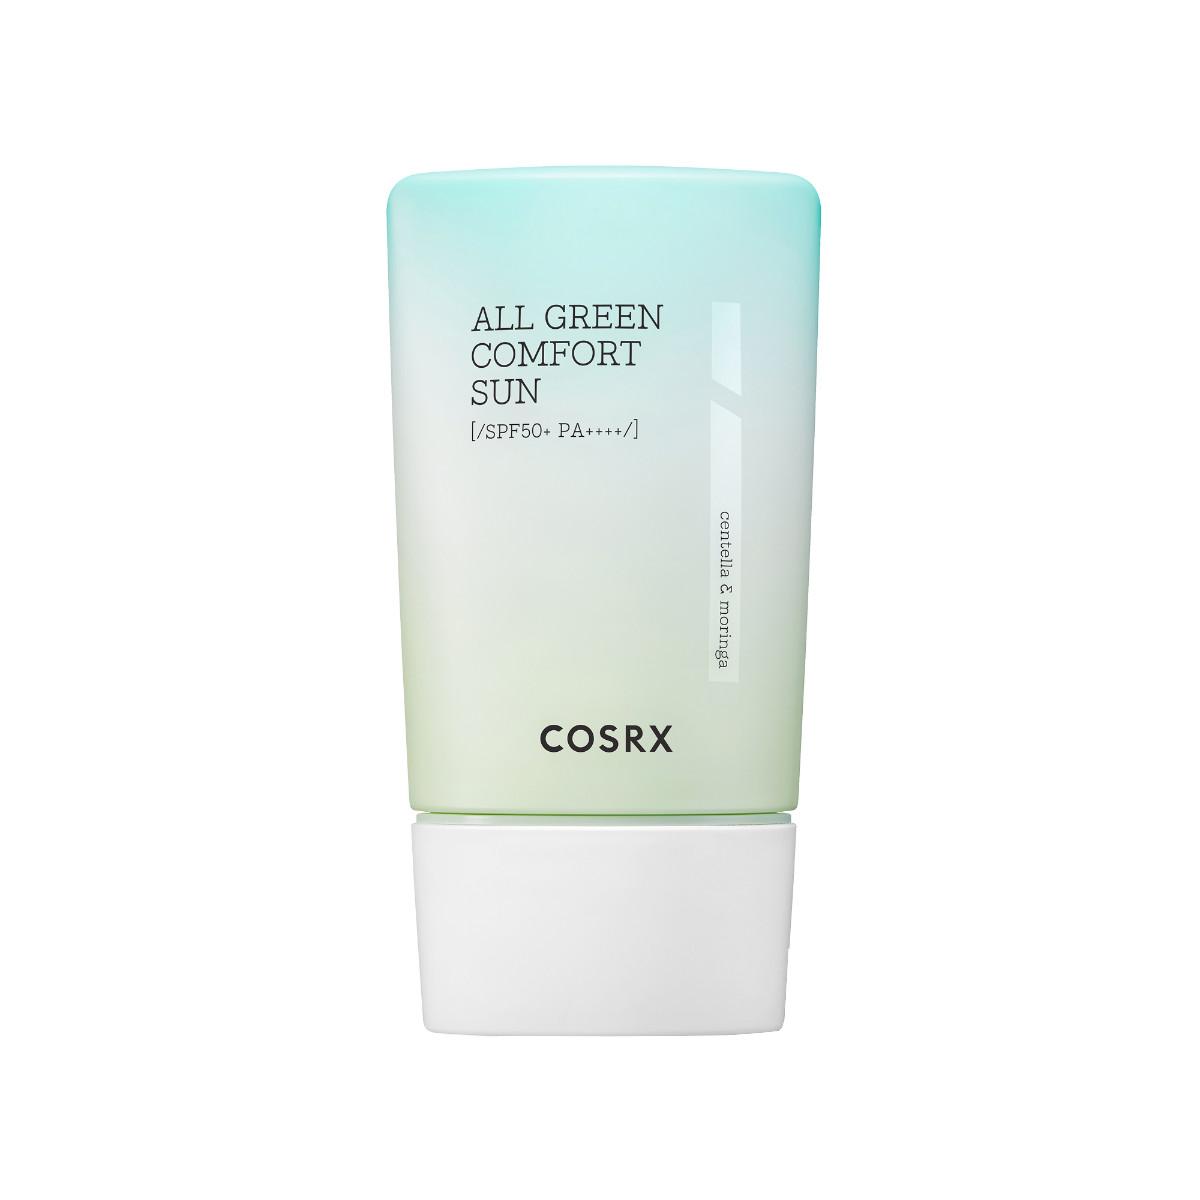 Kem Chống Nắng Cosrx Shield Fit All Green Comfort Sun SPF 50+ PA++++ 50ml